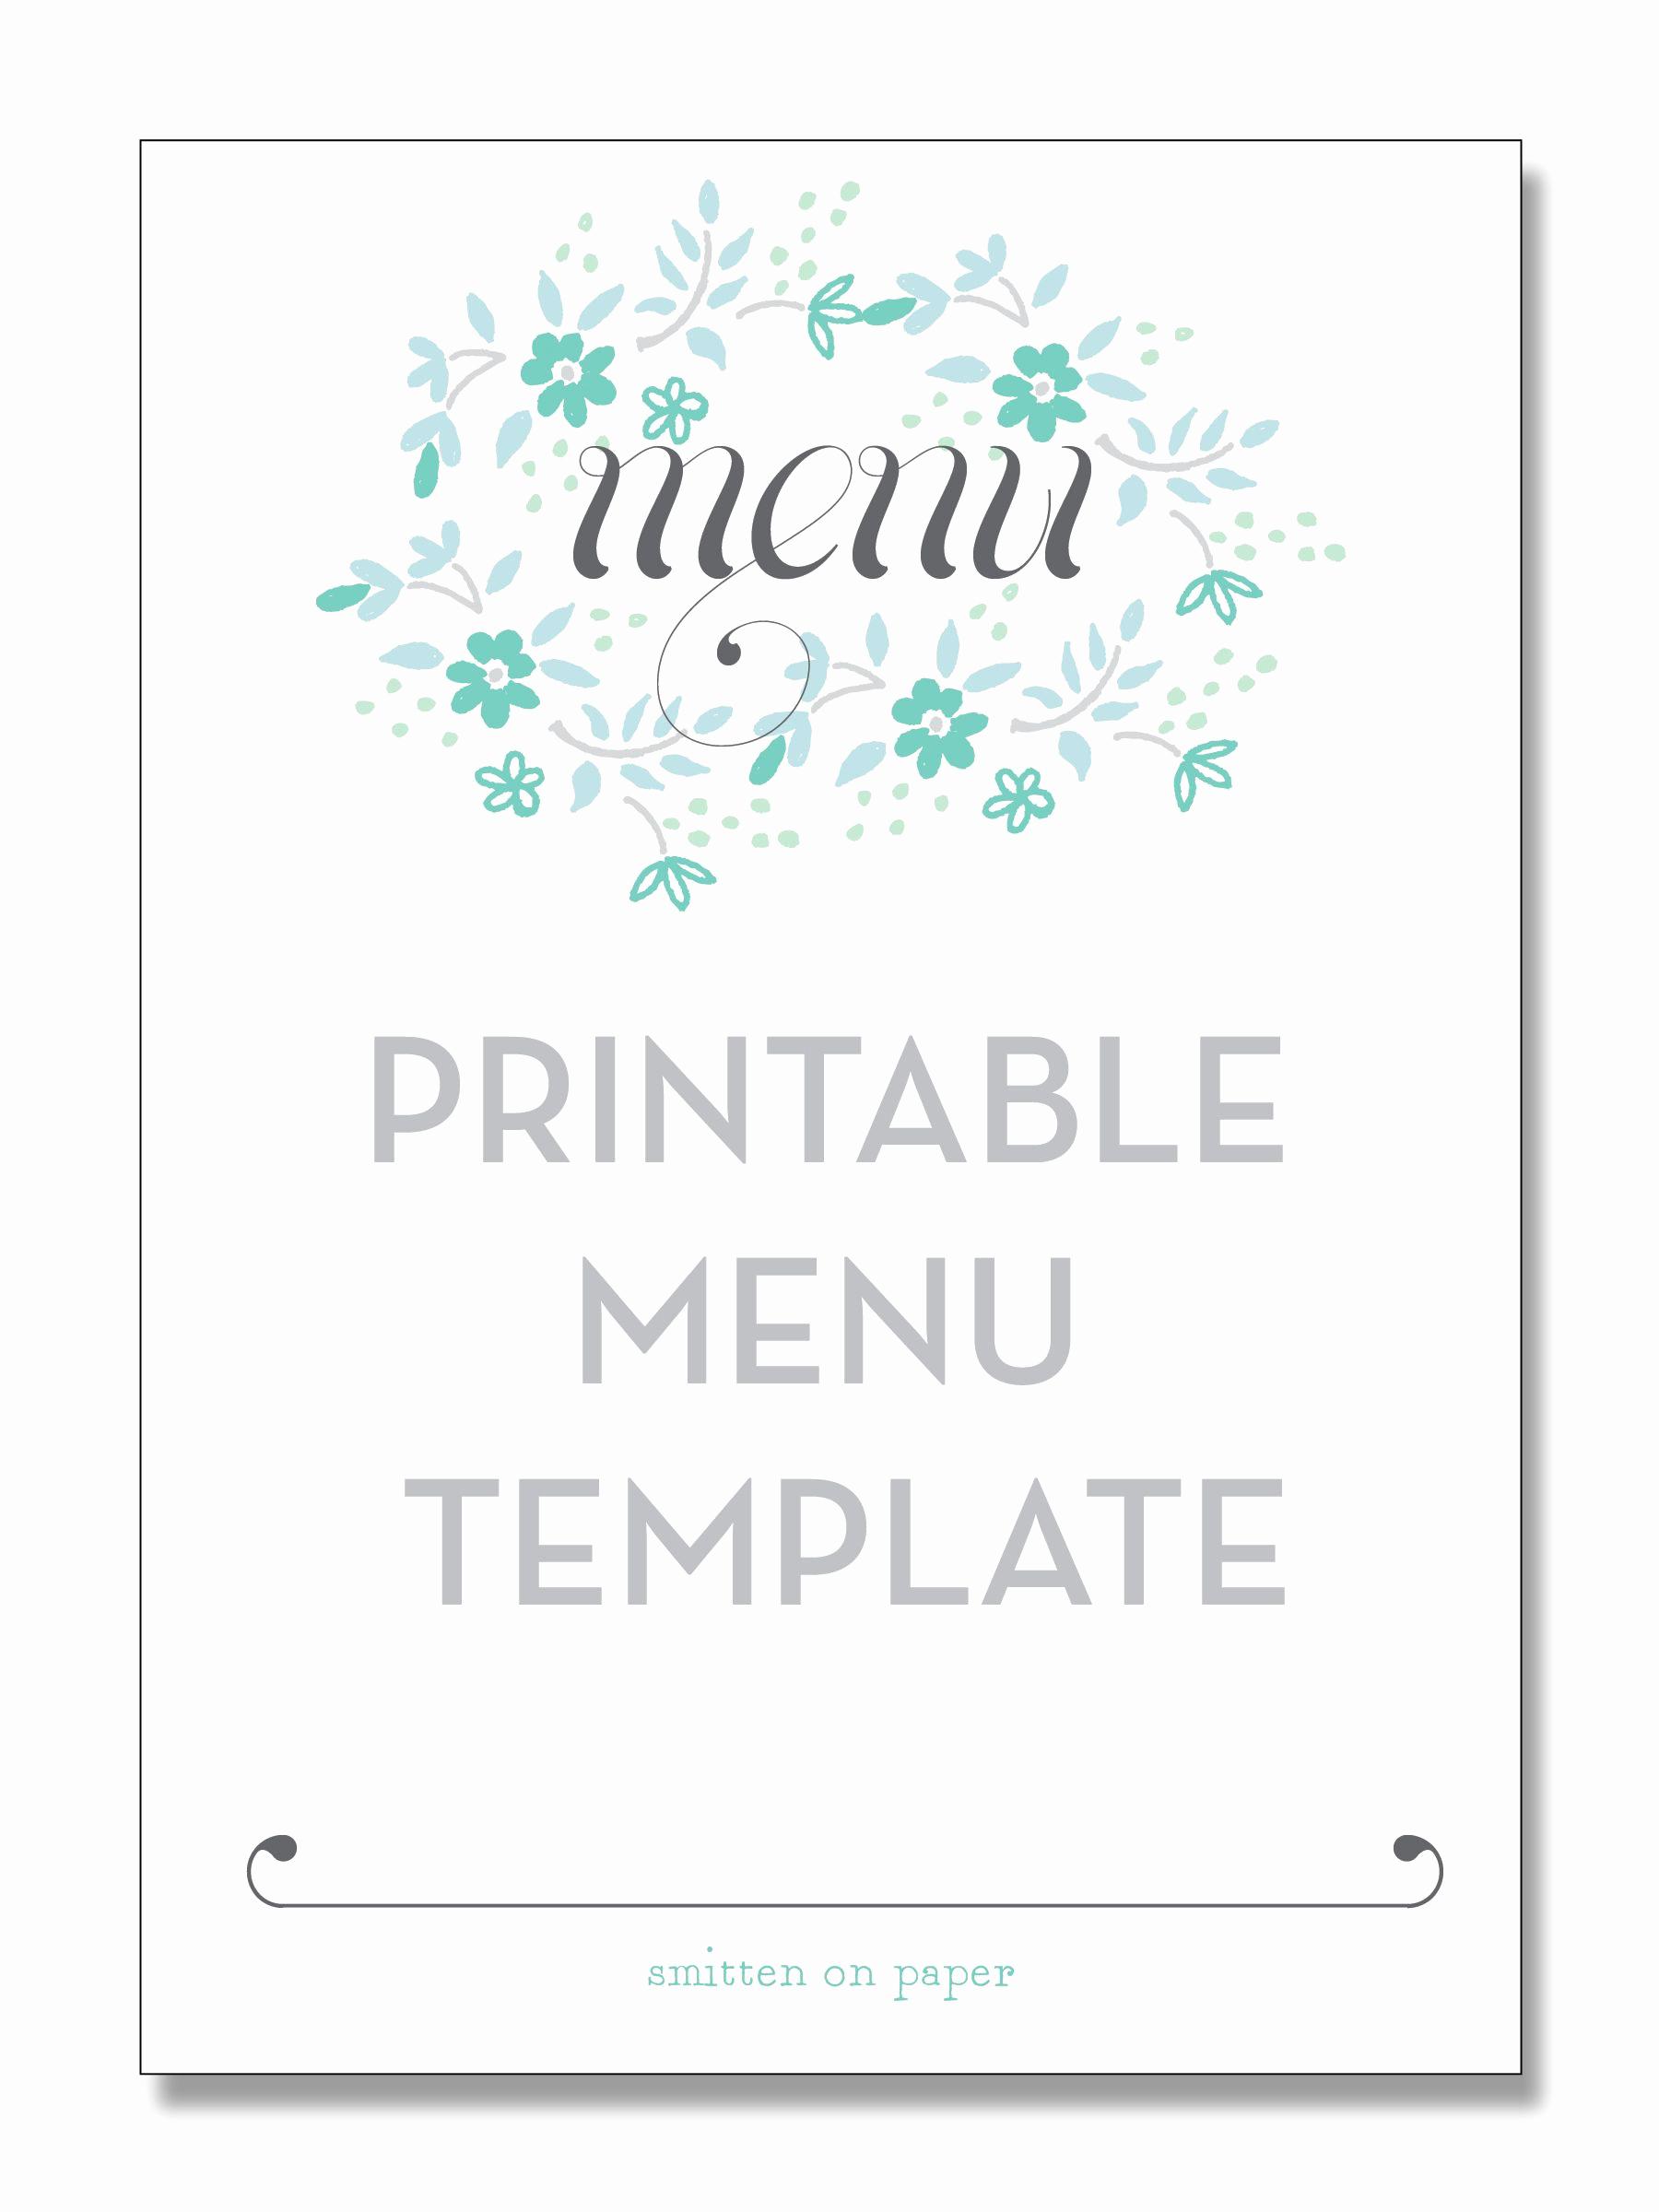 Free Online Menu Templates Awesome Freebie Friday Printable Menu Party Time